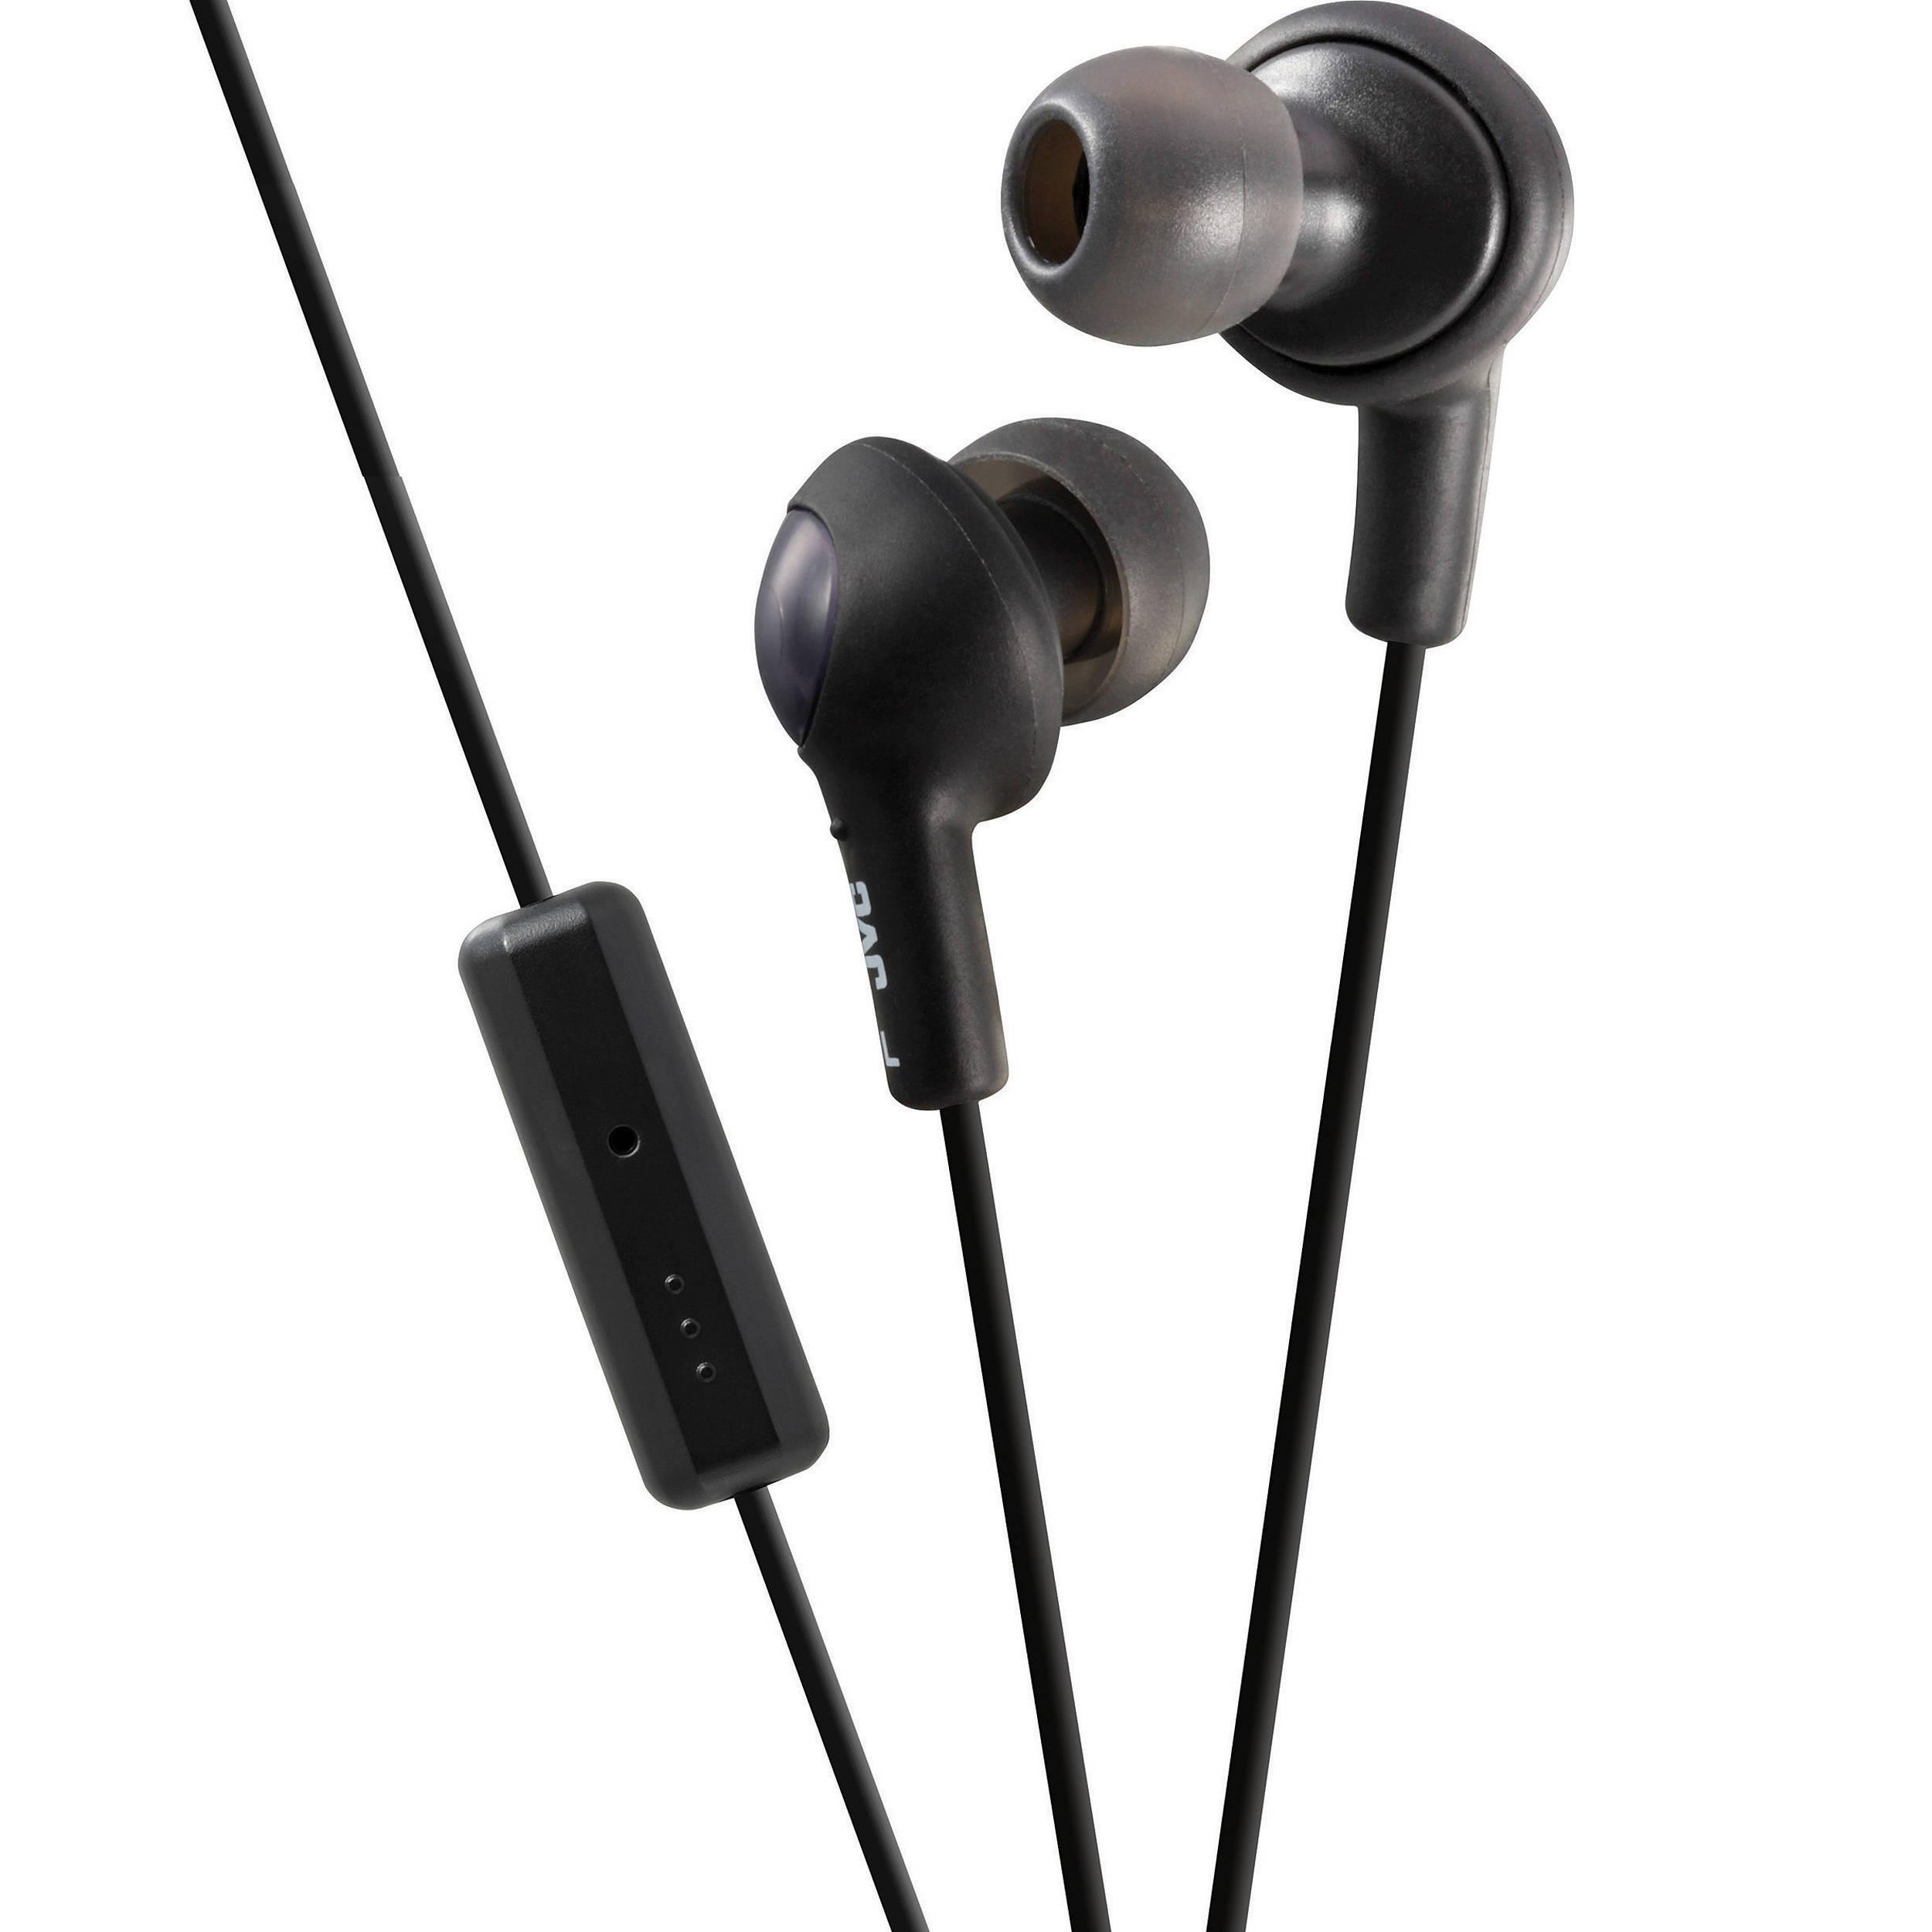 JVC HA-FR6 Gumy Plus Earbuds (Black) HA-FR6B B H Photo Video 5c639f6dbd